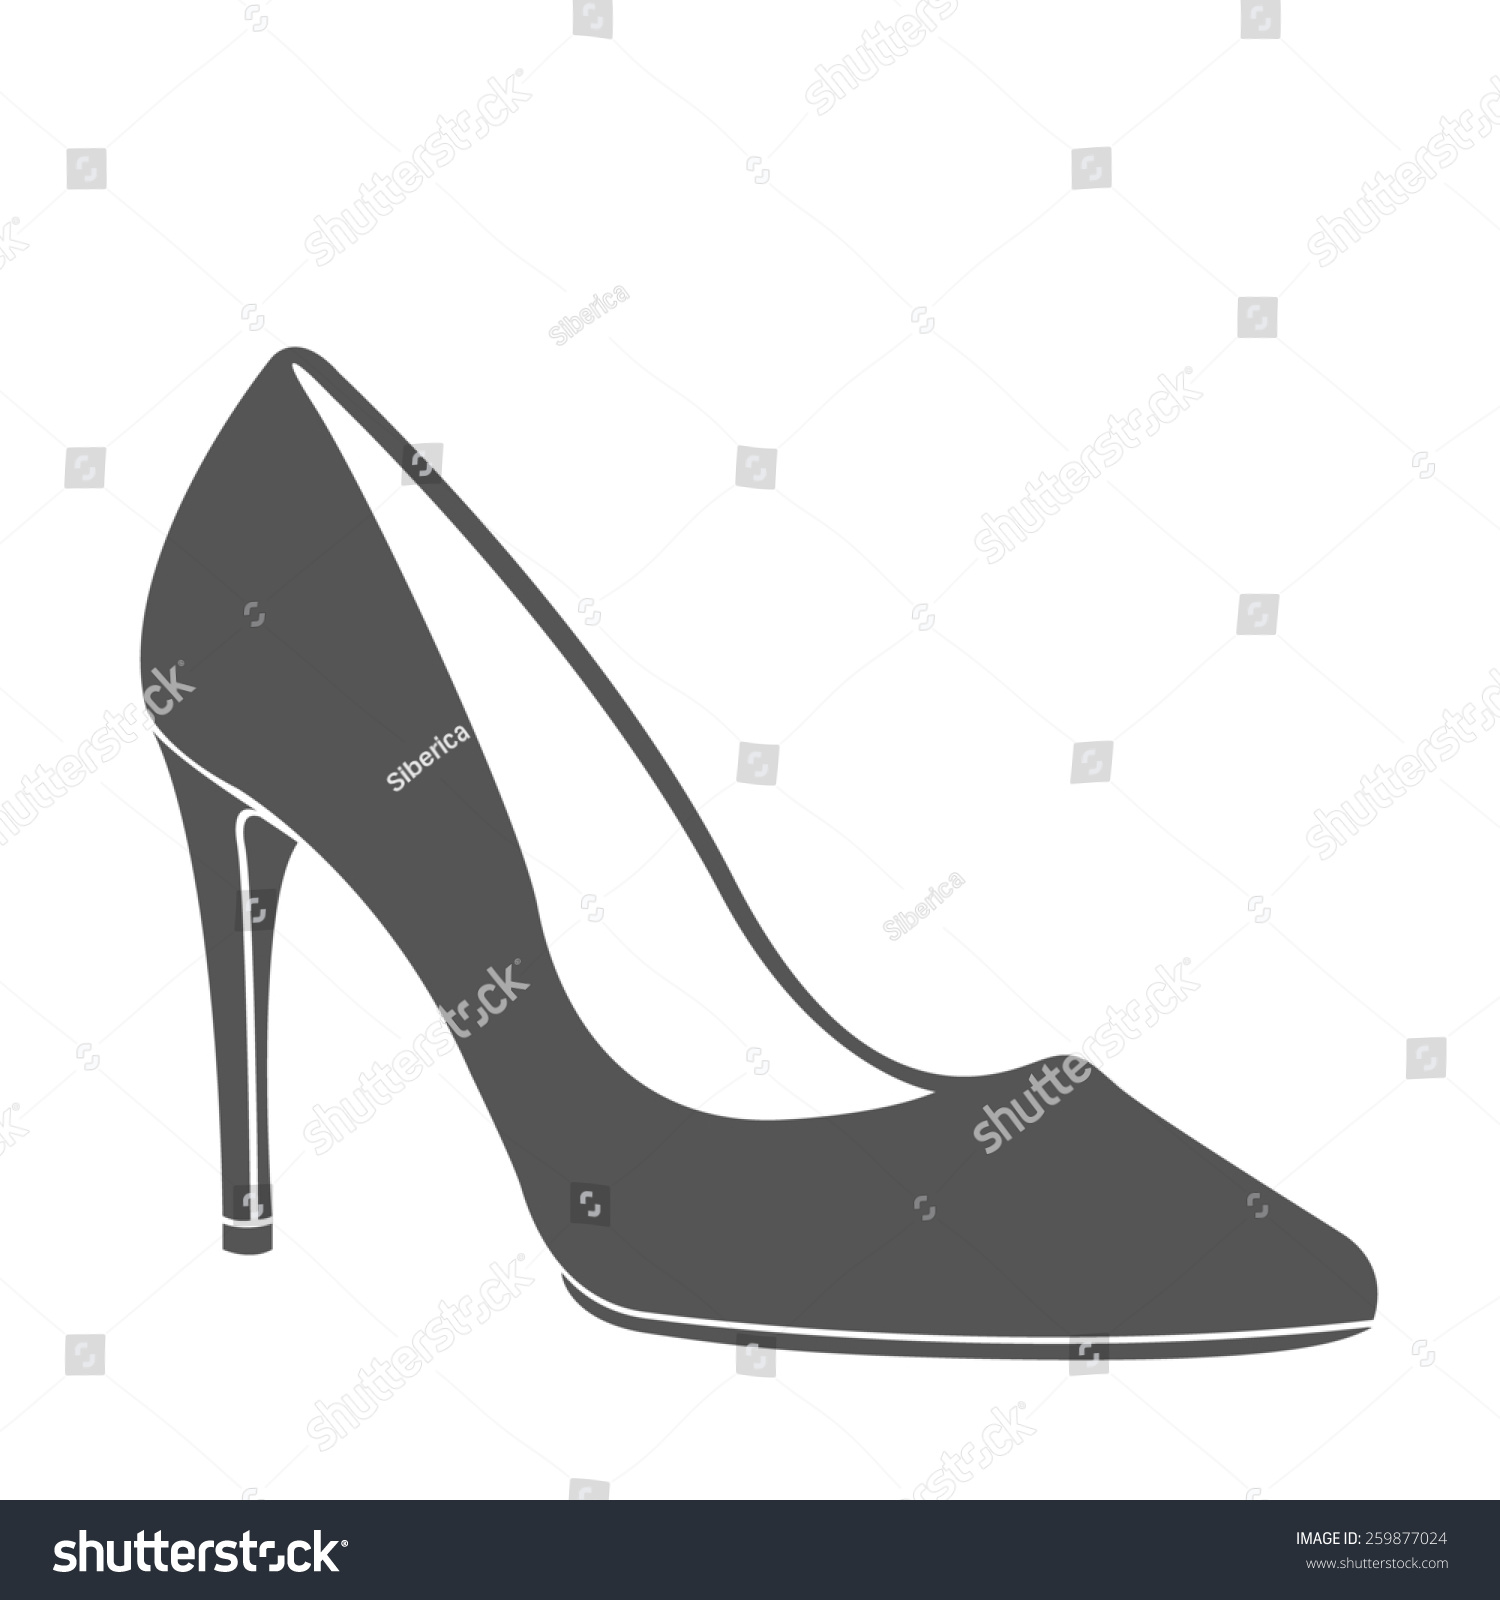 women high heel shoe design template stock illustration 259877024